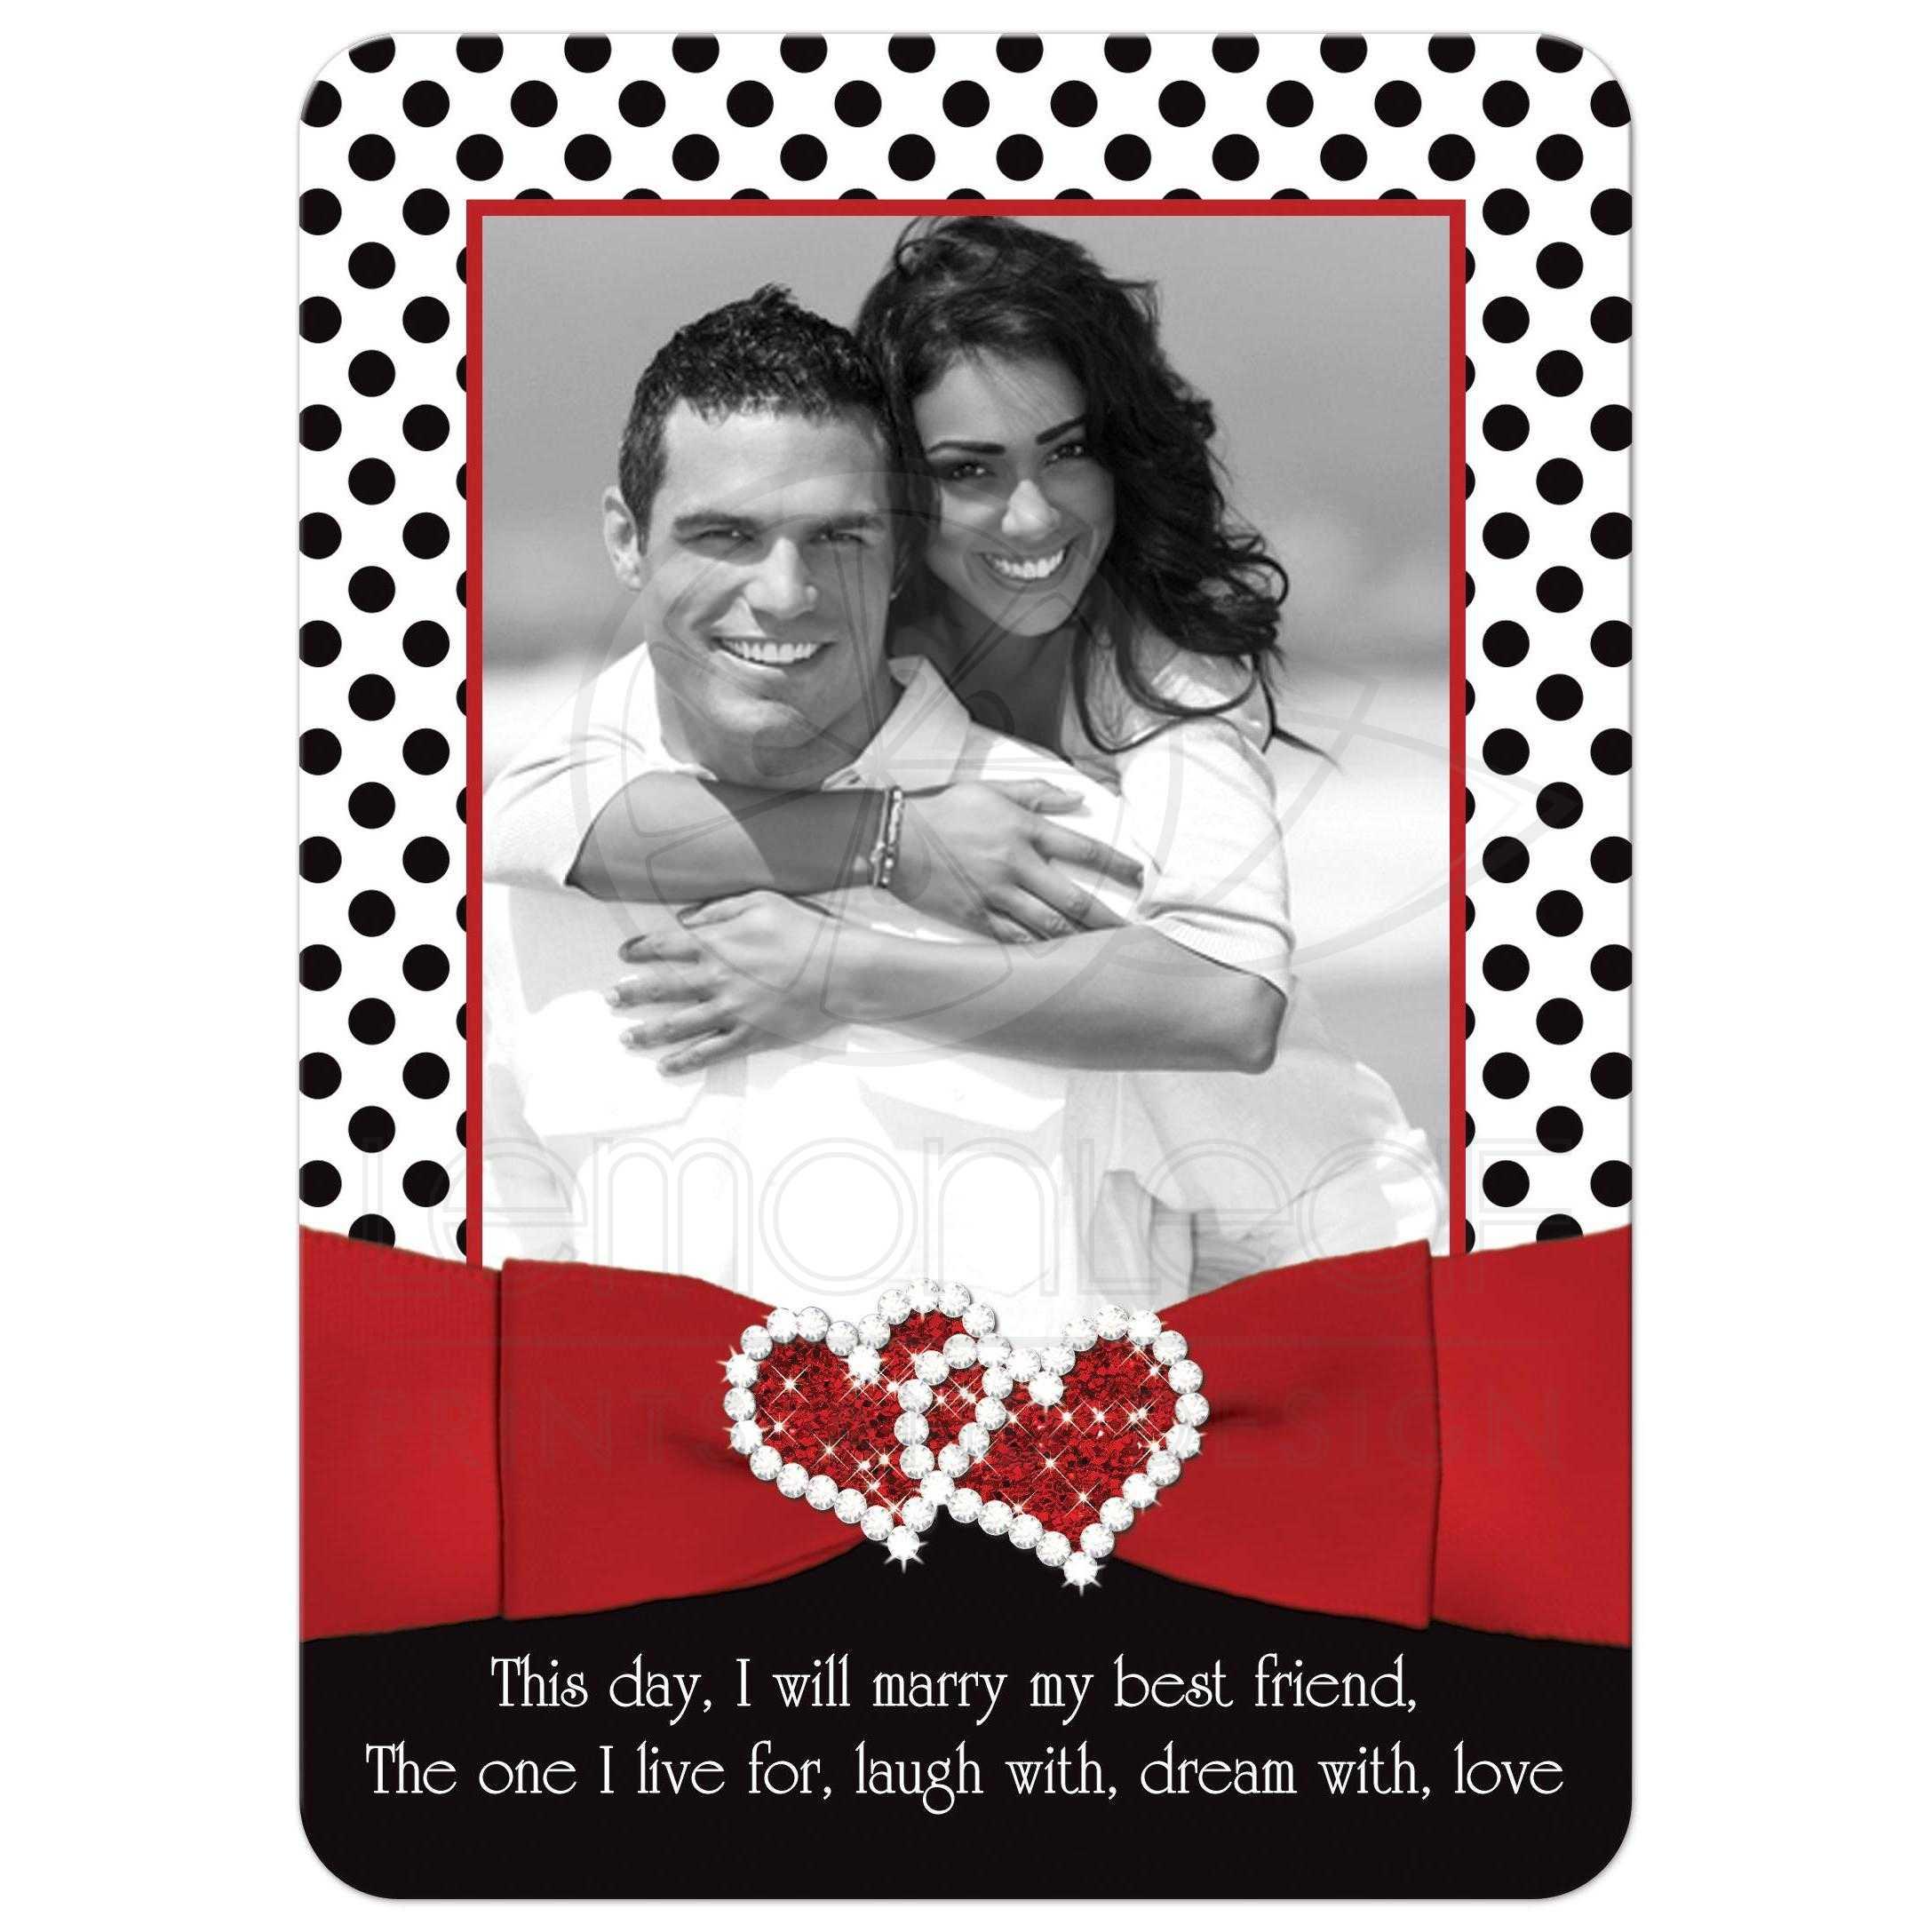 Wedding Invitation | Black, White Red | Polka Dots | Photo | Printed ...